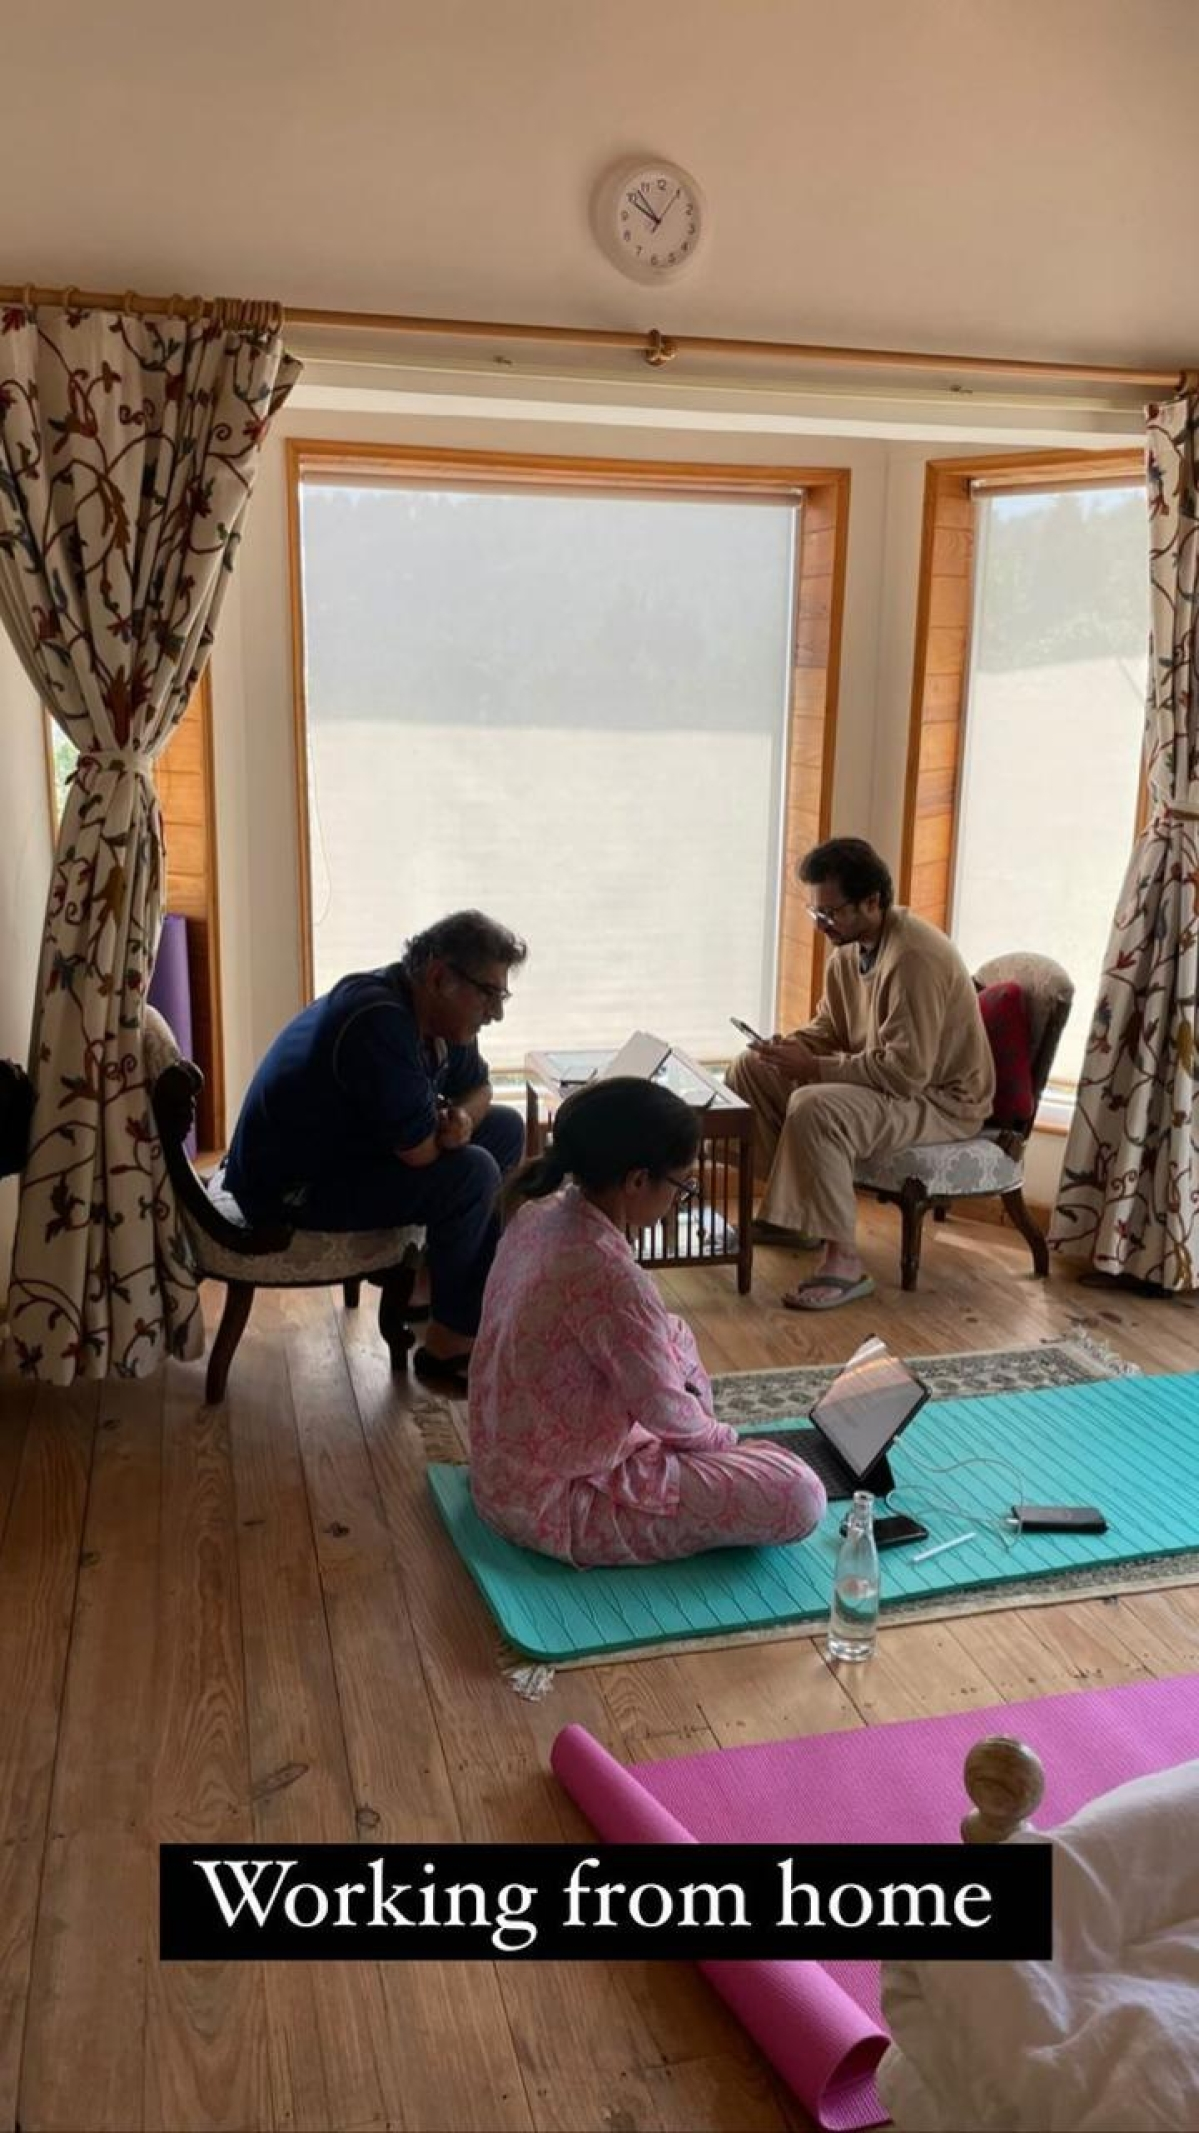 Neena Gupta gives glimpse of 'work from home' scene - can you spot Masaba's rumoured beau Satyadeep Misra?